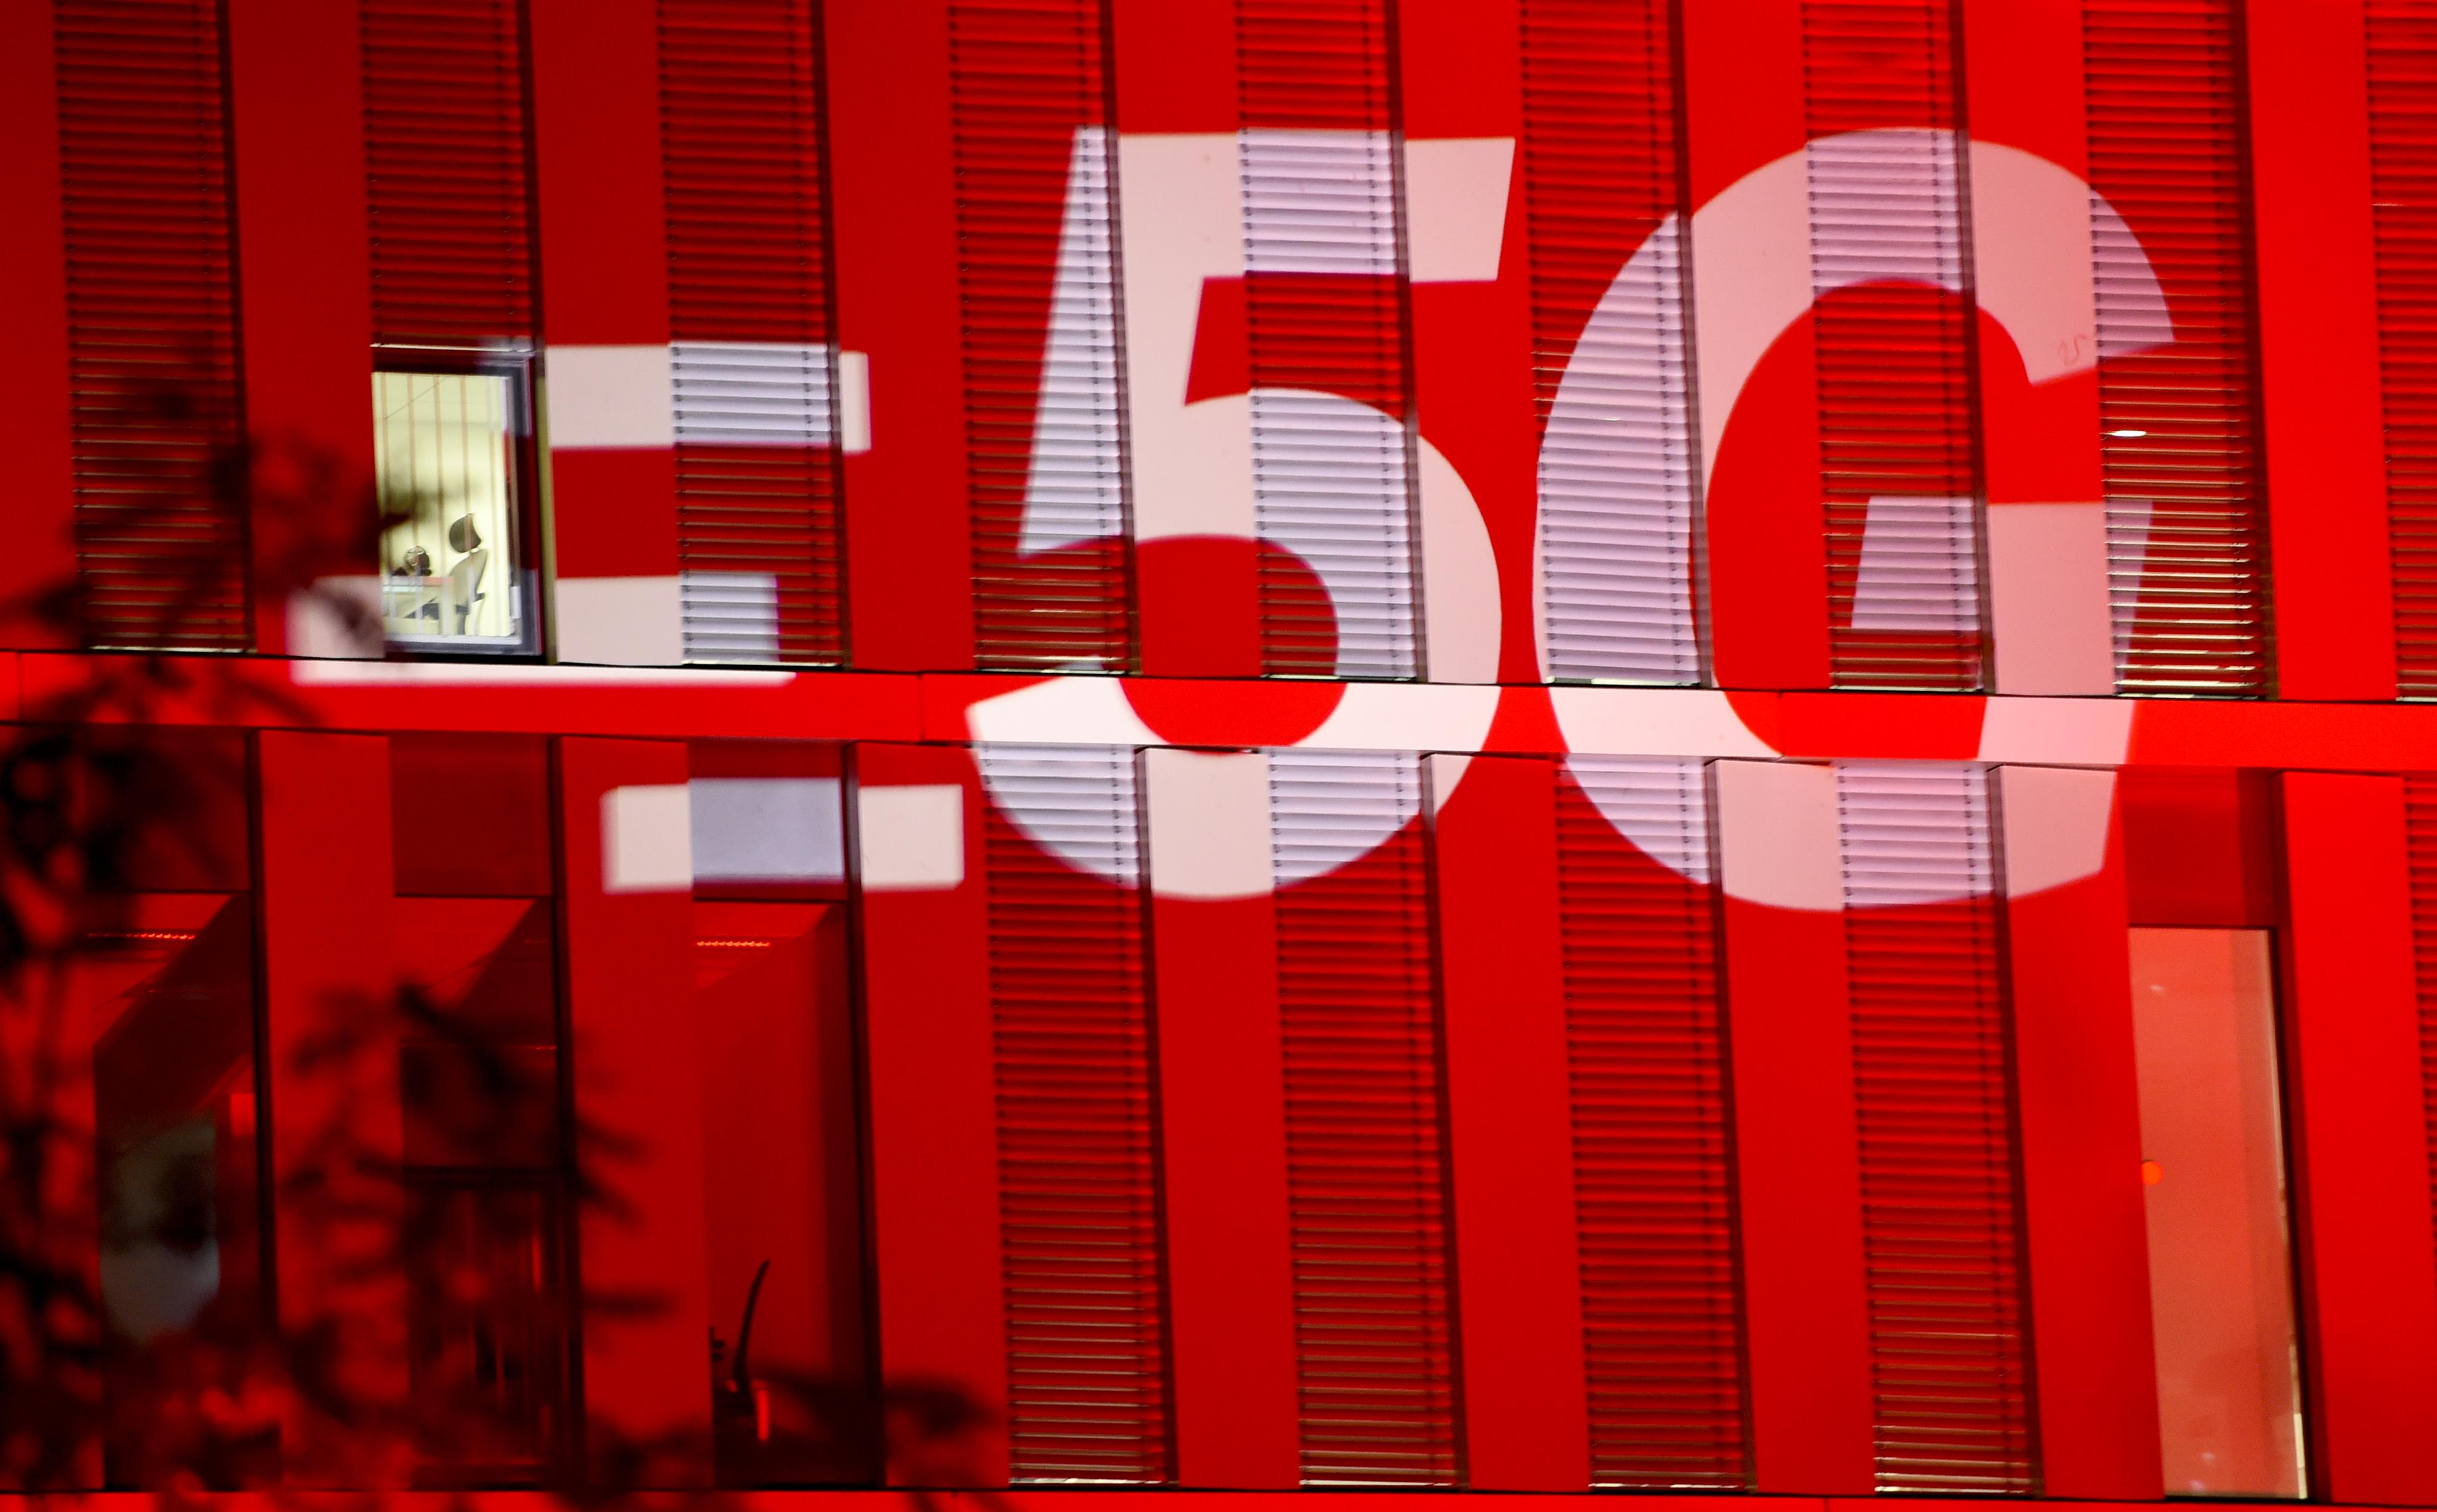 5G wireless symbol